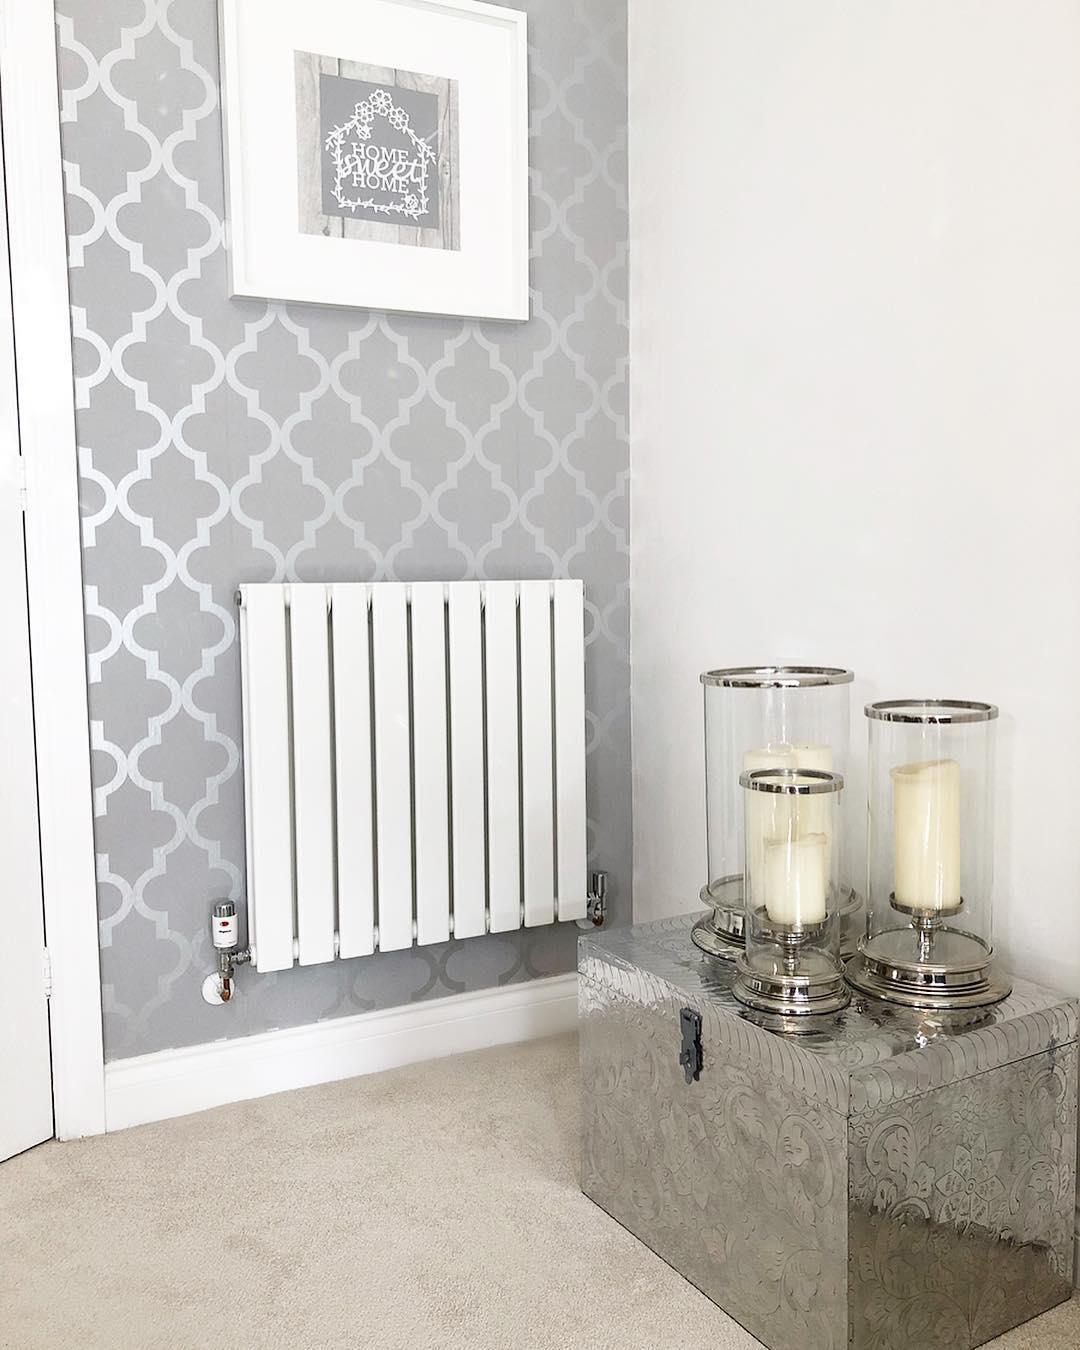 A white Milano Alpha designer radiator with thermostatic valves.